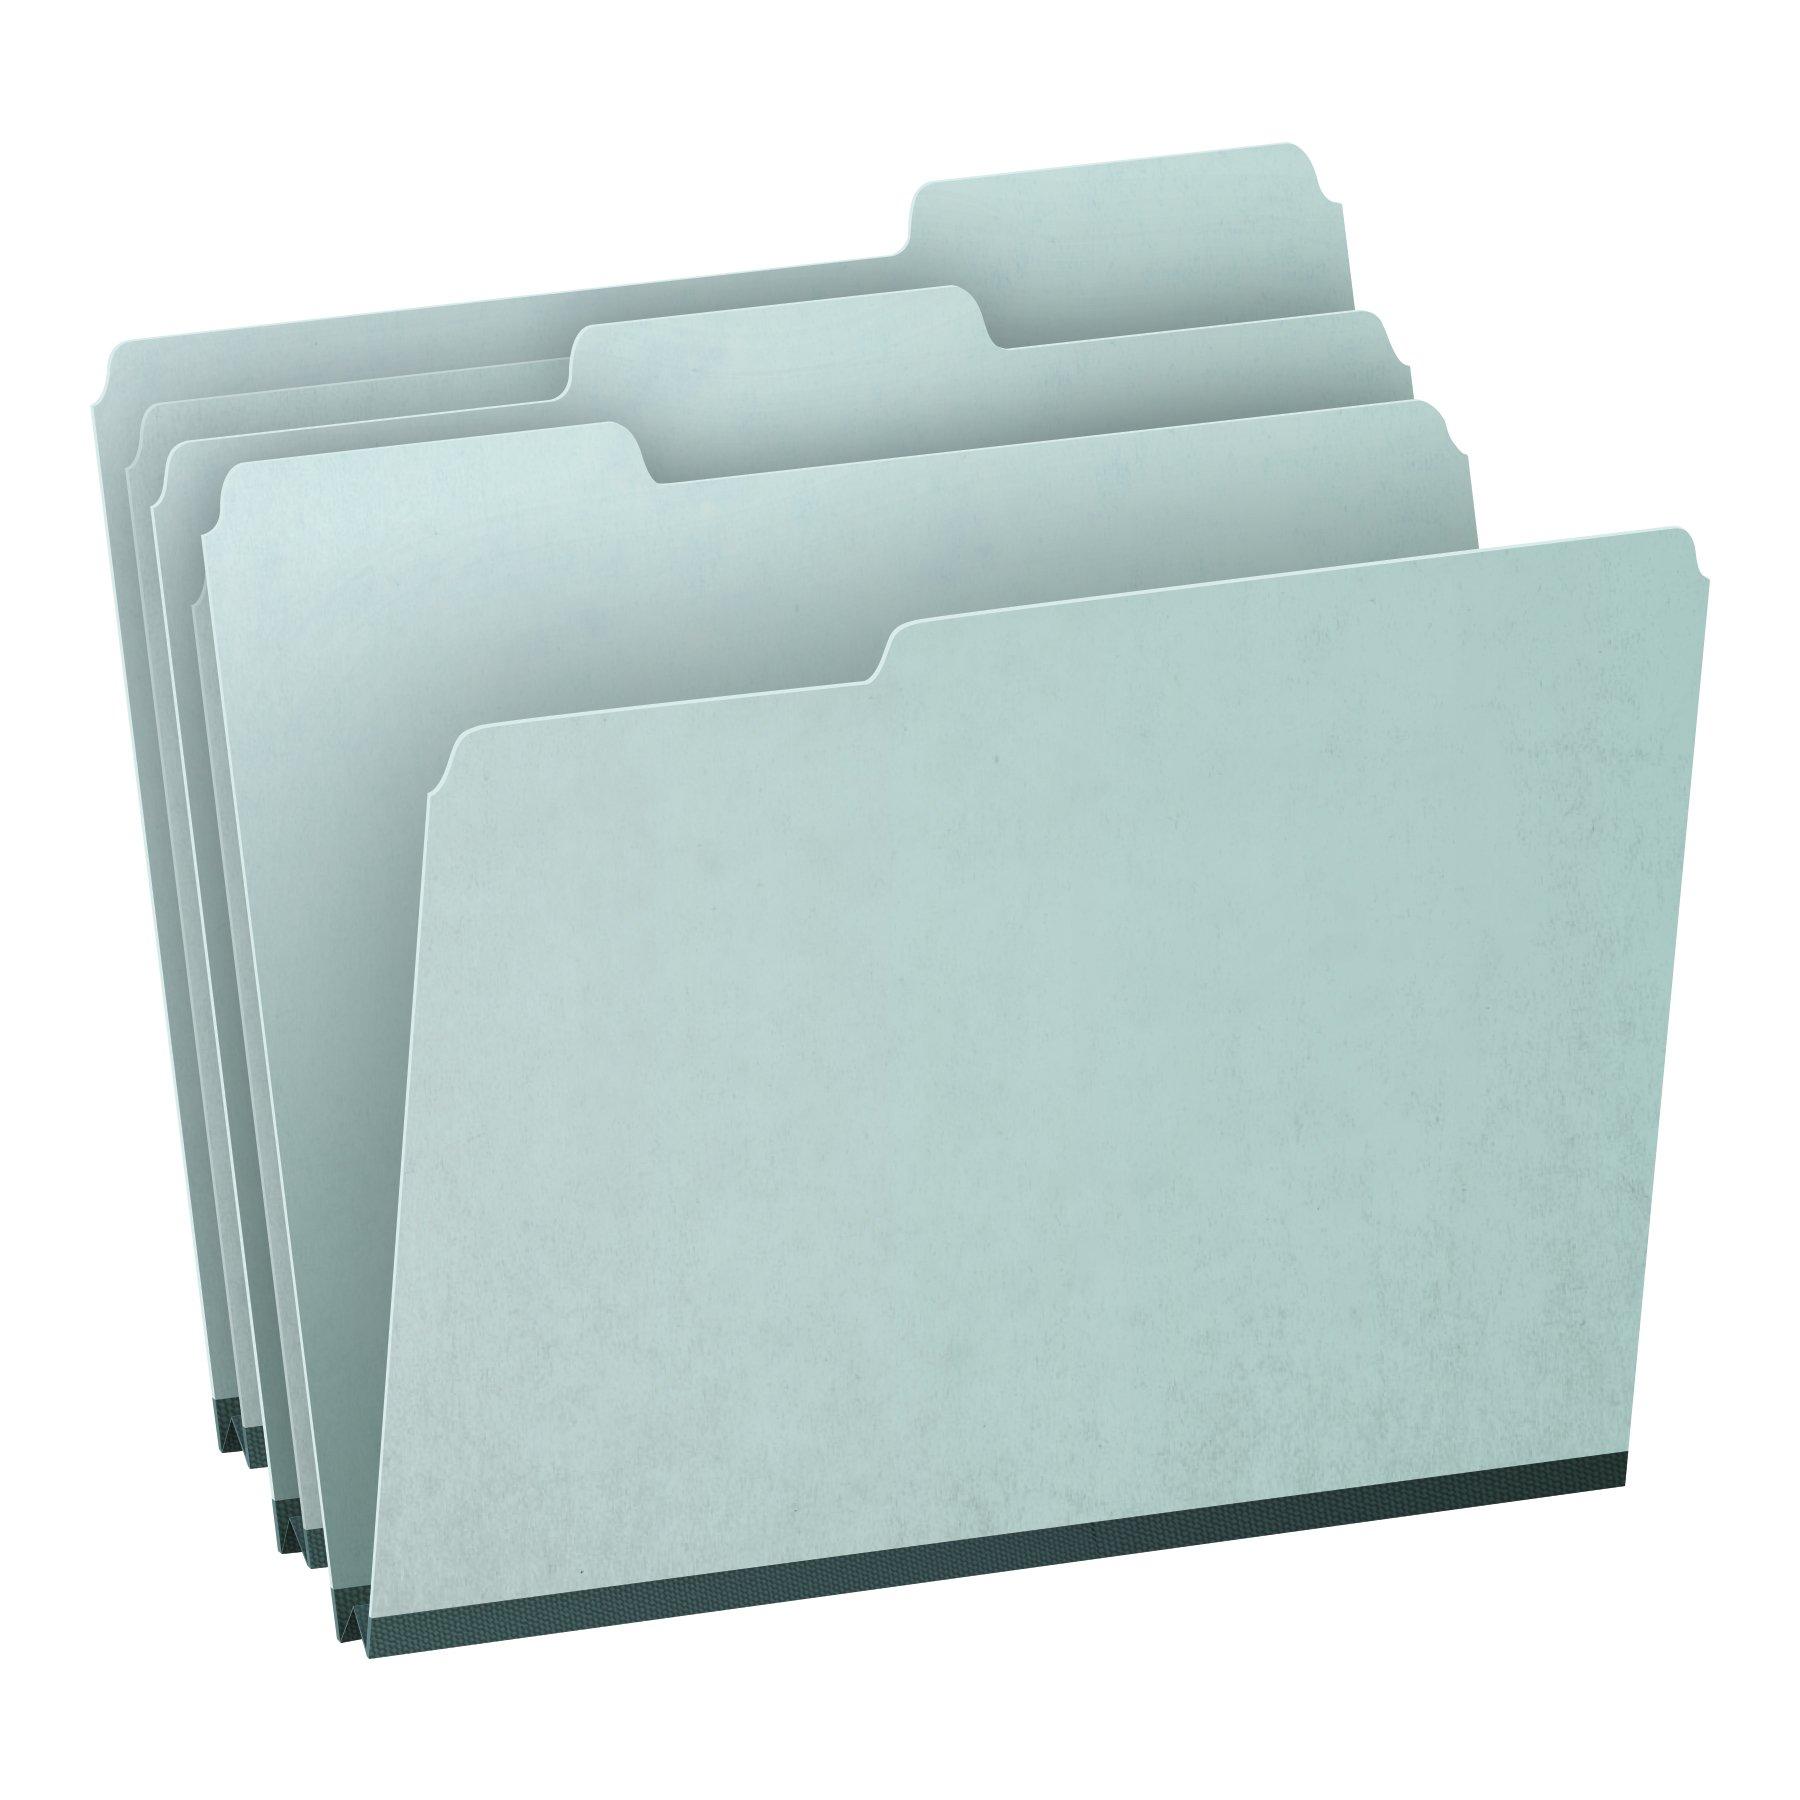 Pendaflex 1'' Expansion Pressboard File Folders with 1/3 Cut Tab, Letter, Blue, 25/Box (9200T 1/3)